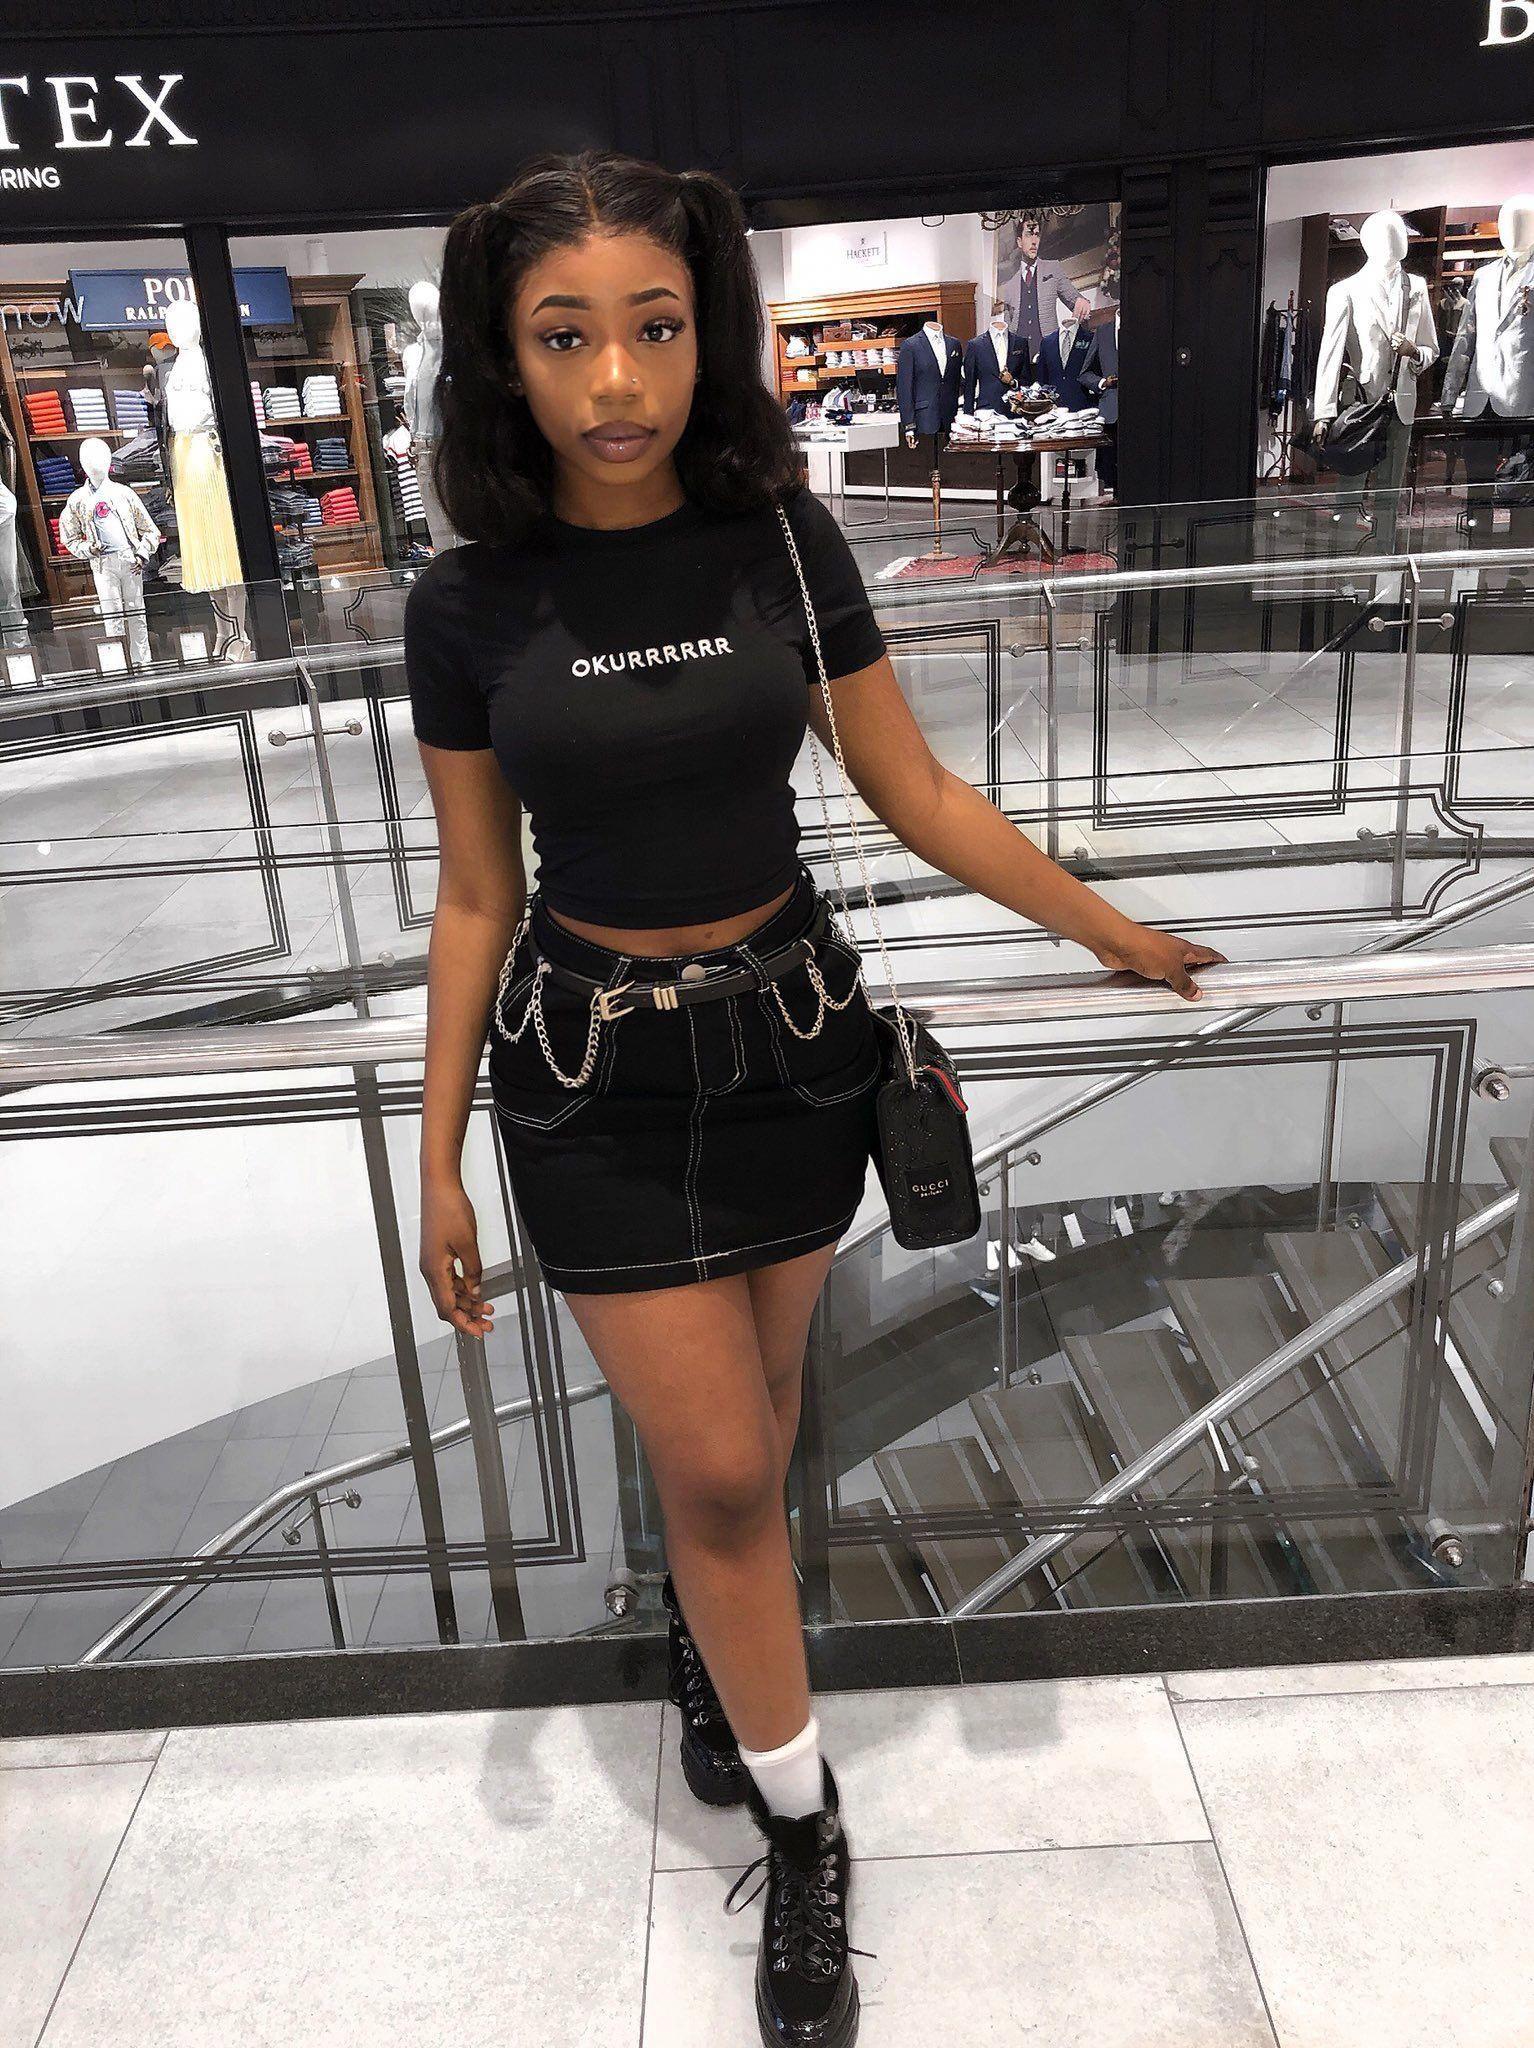 Womens Black Fashion Short Wigs Blackwomensfashion With Images